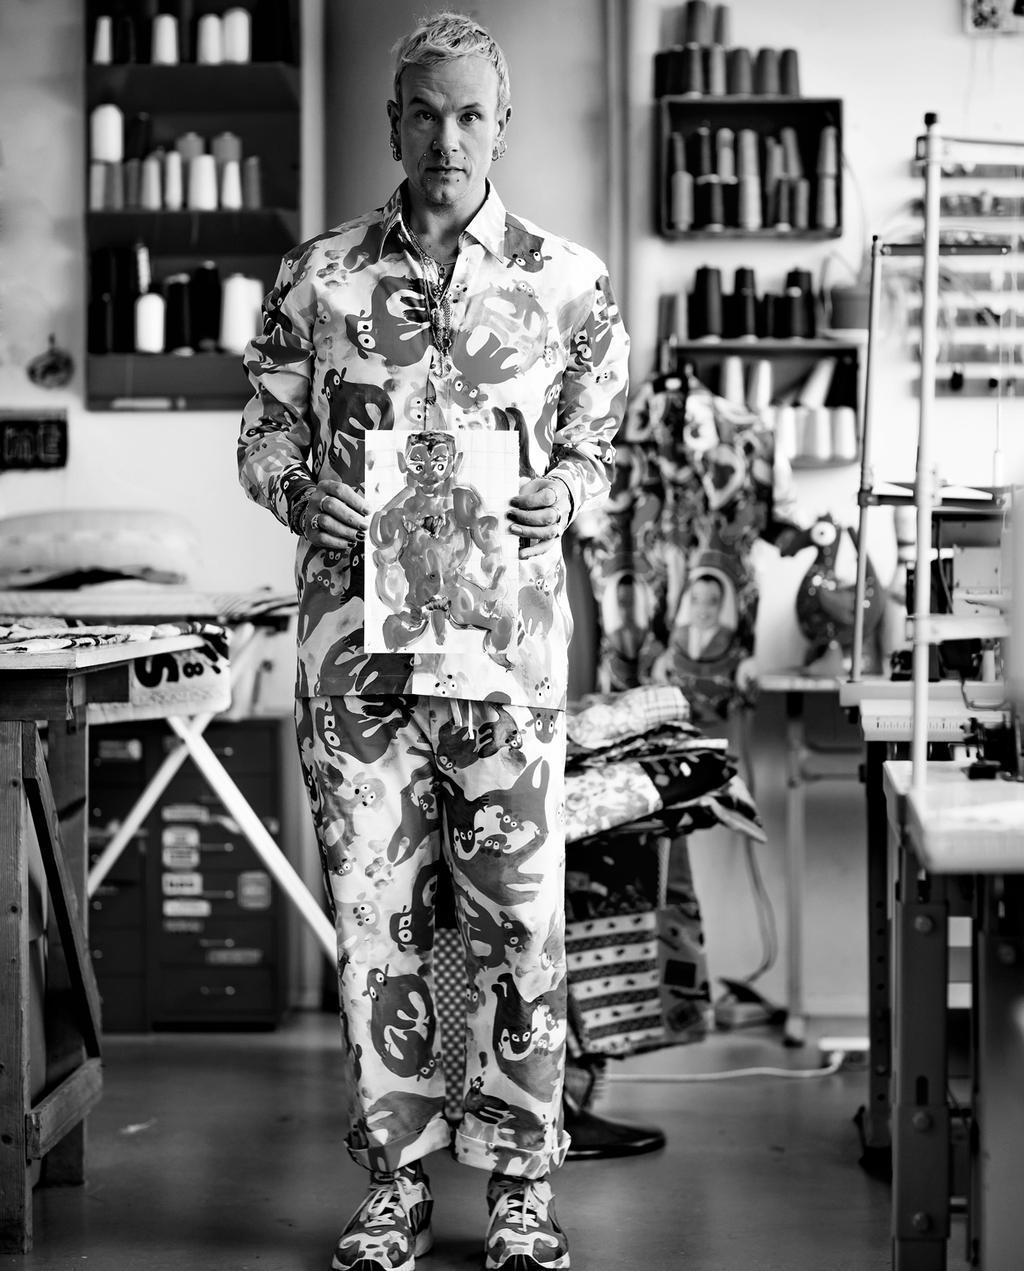 vtwonen 7-2019 | Bas Kosters atelier portret